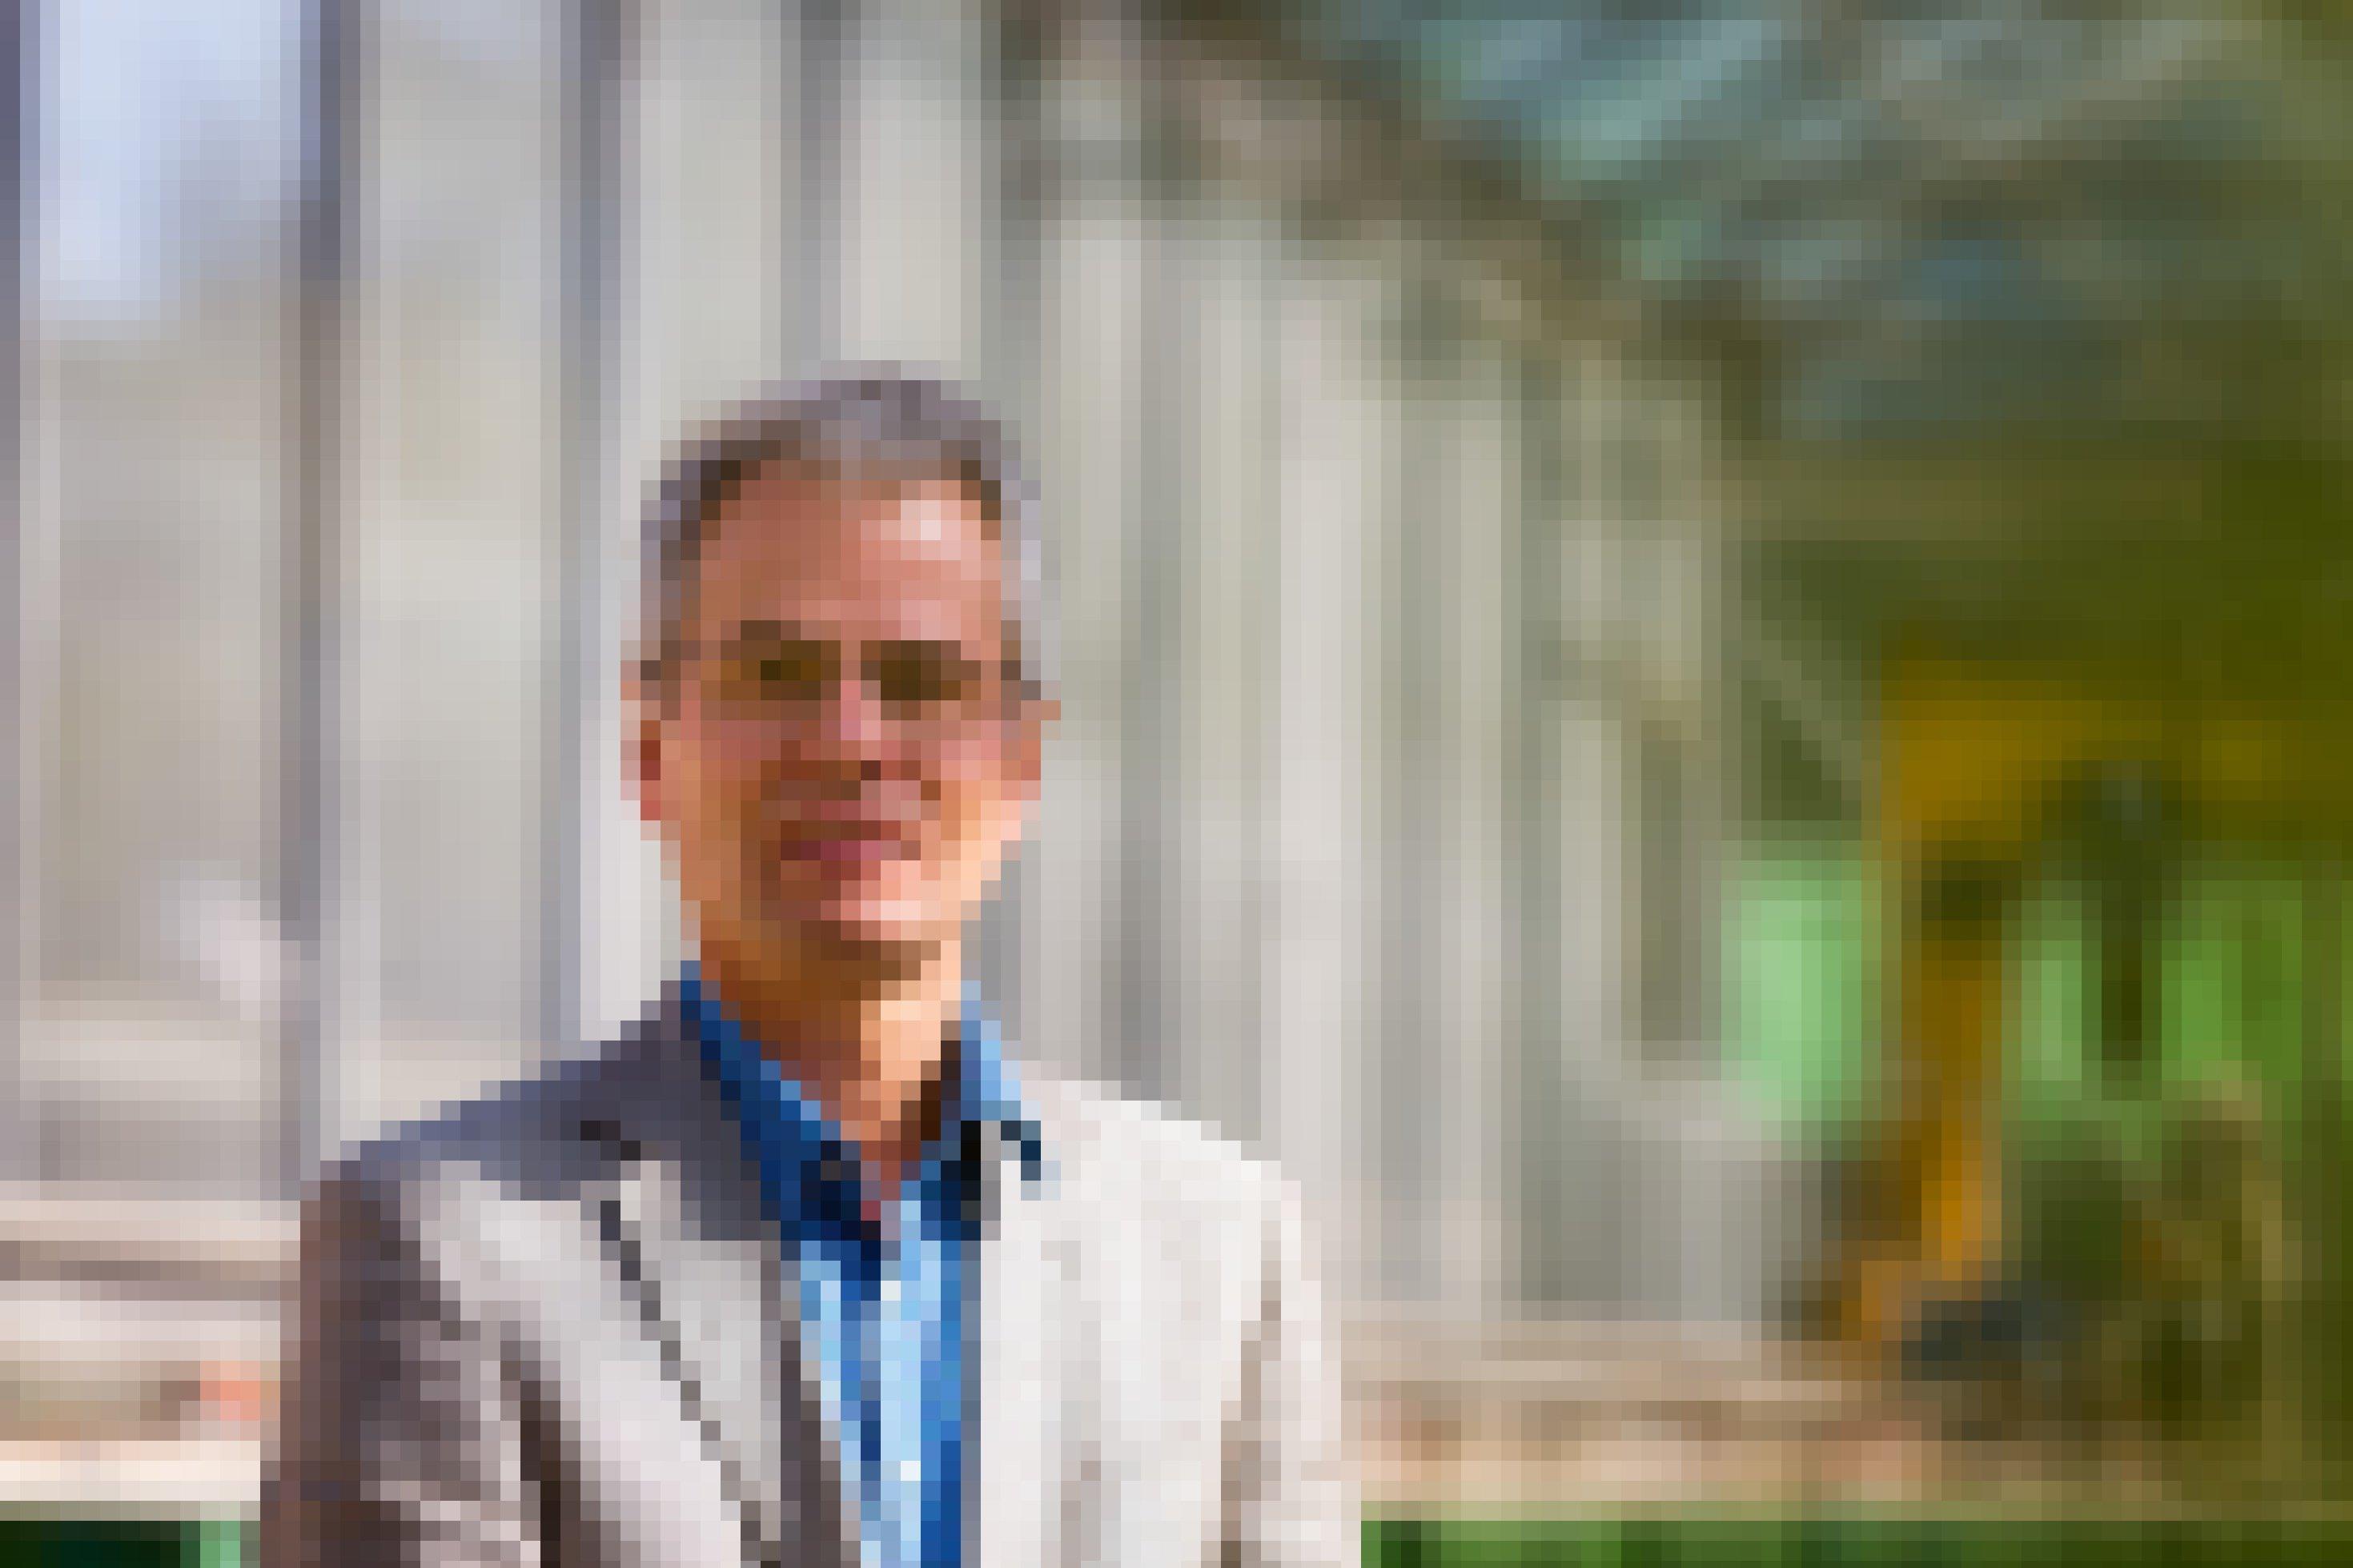 Portrait des Wissenschaftlers Hans de Kroon von der Radboud-Universität in Nimwegen.